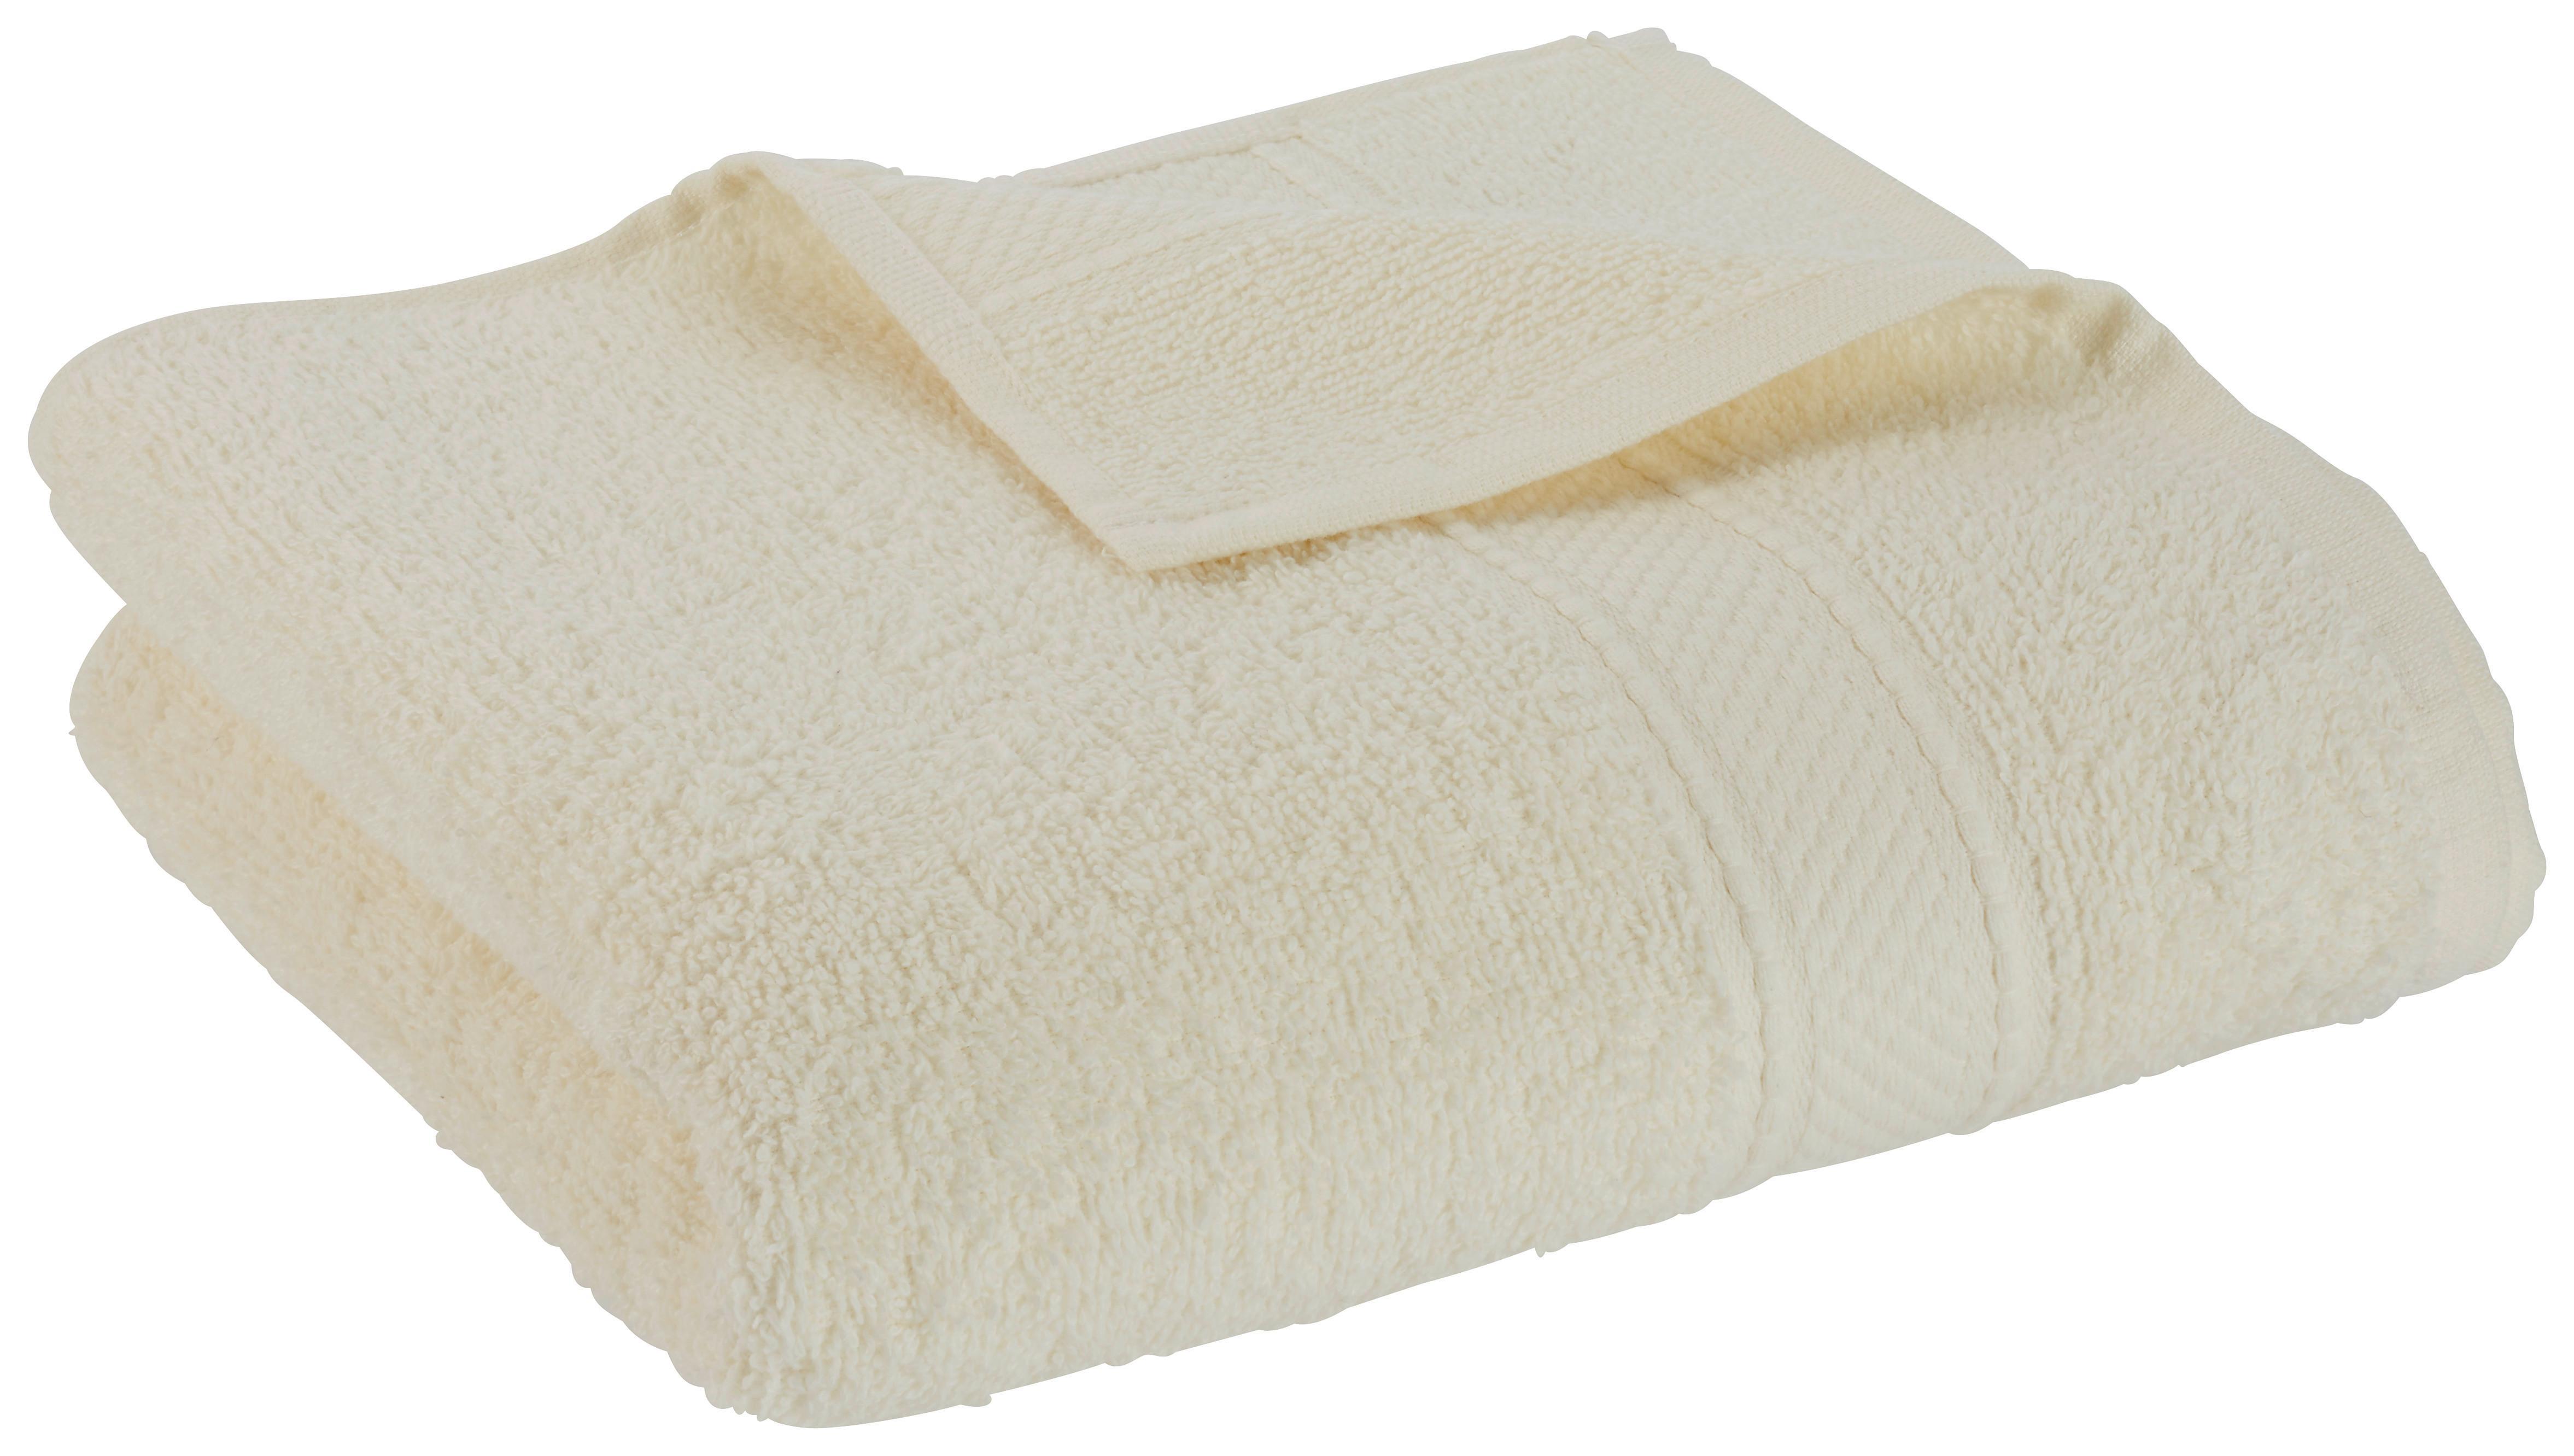 Handtuch Cindy in Offwhite ca. 50x100cm